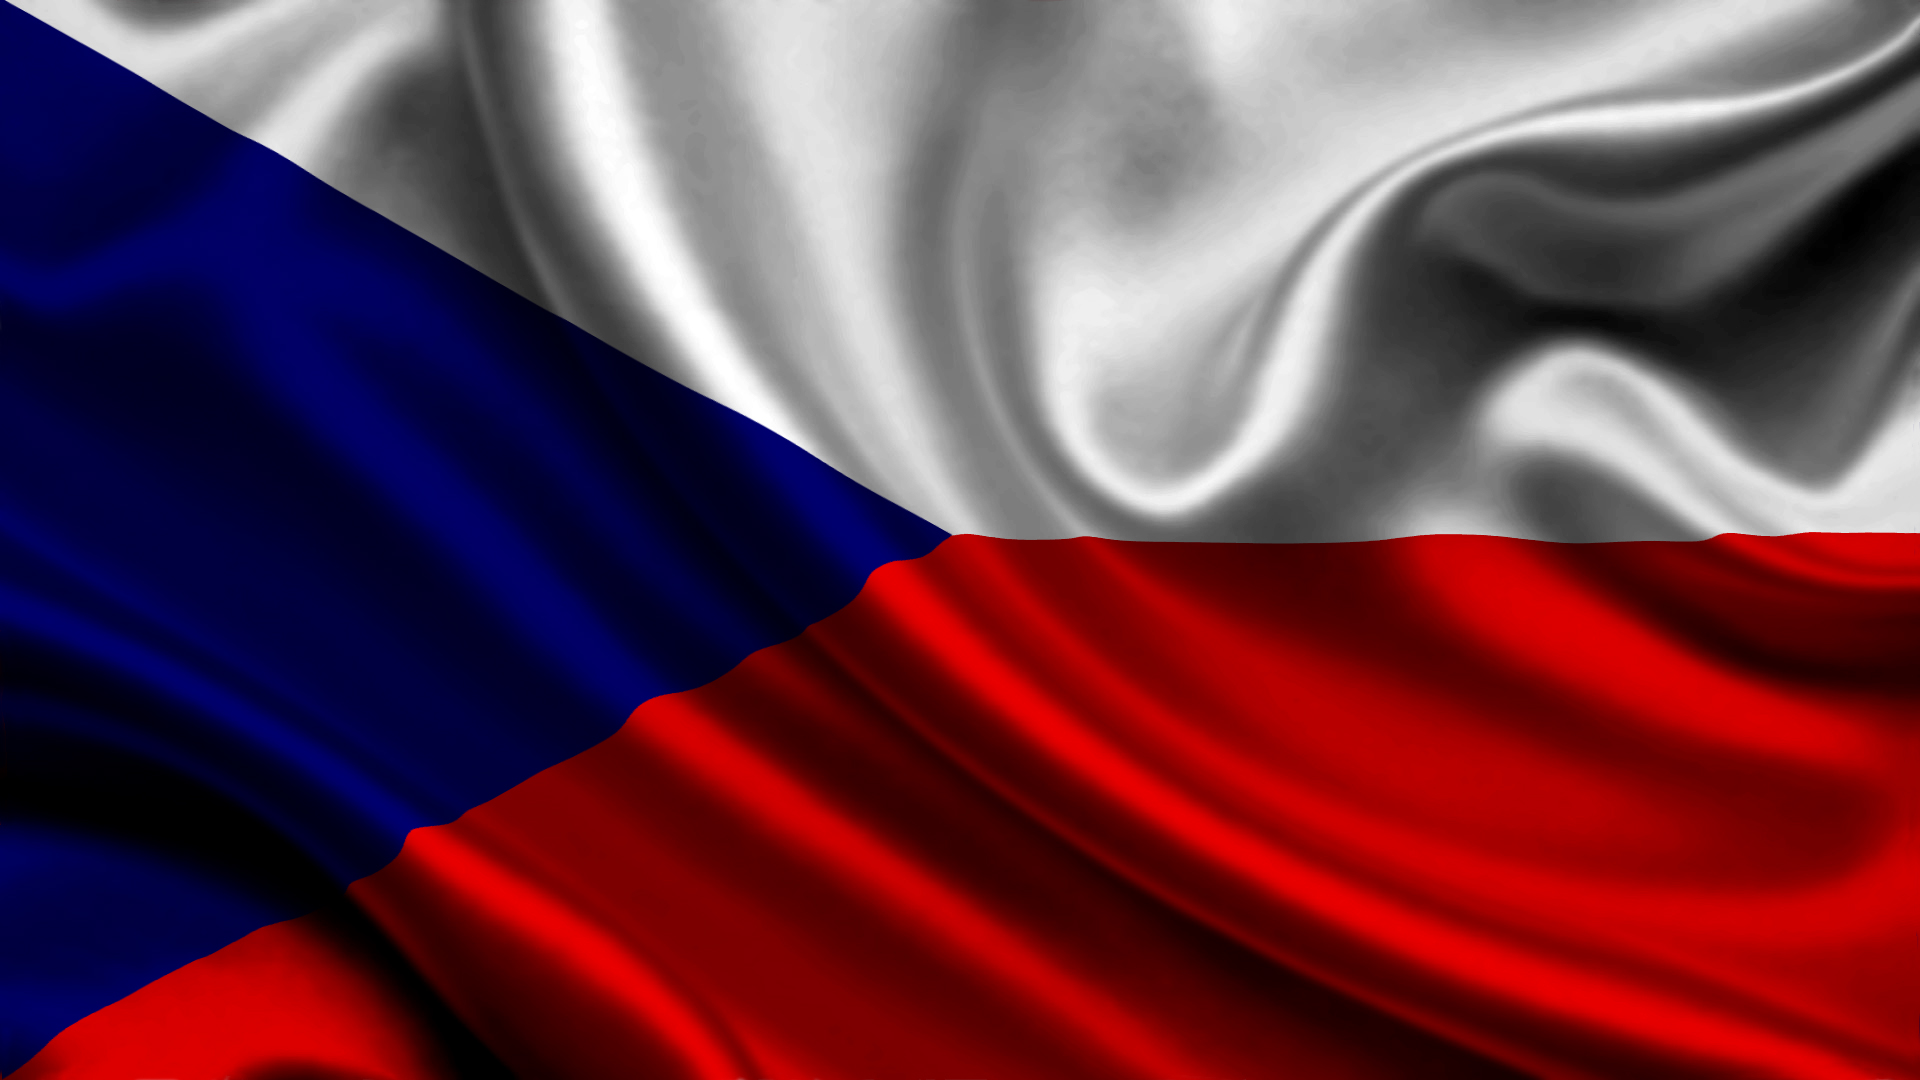 Pictures The Czech Republic Flag 1920x1080